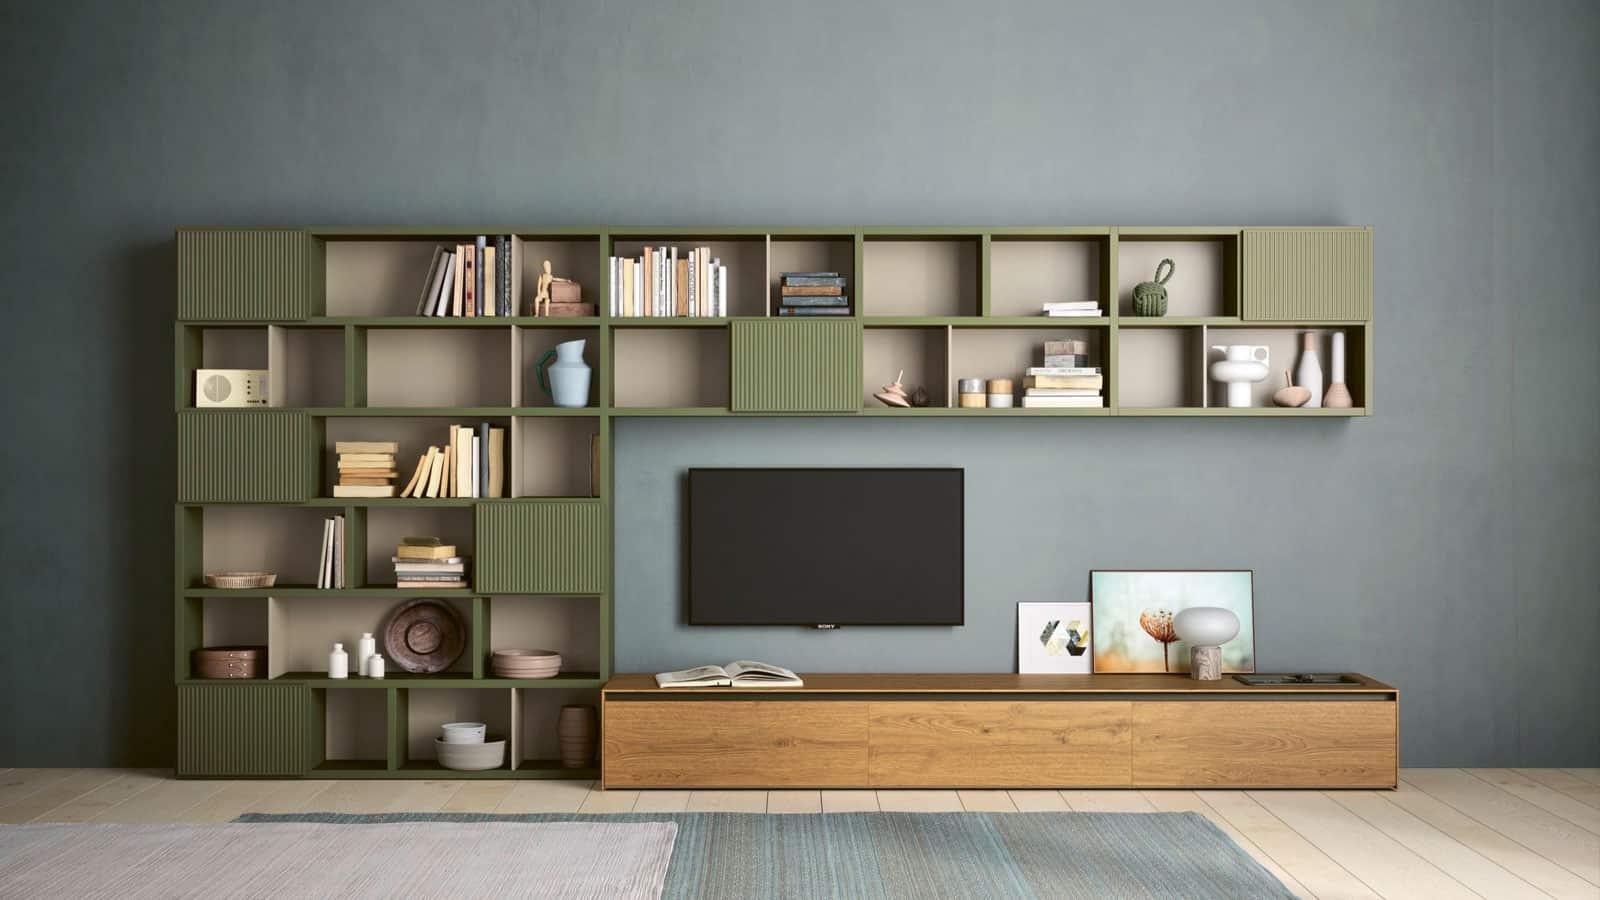 Meuble Tv Bibliotheque Salon Optimal Annecy